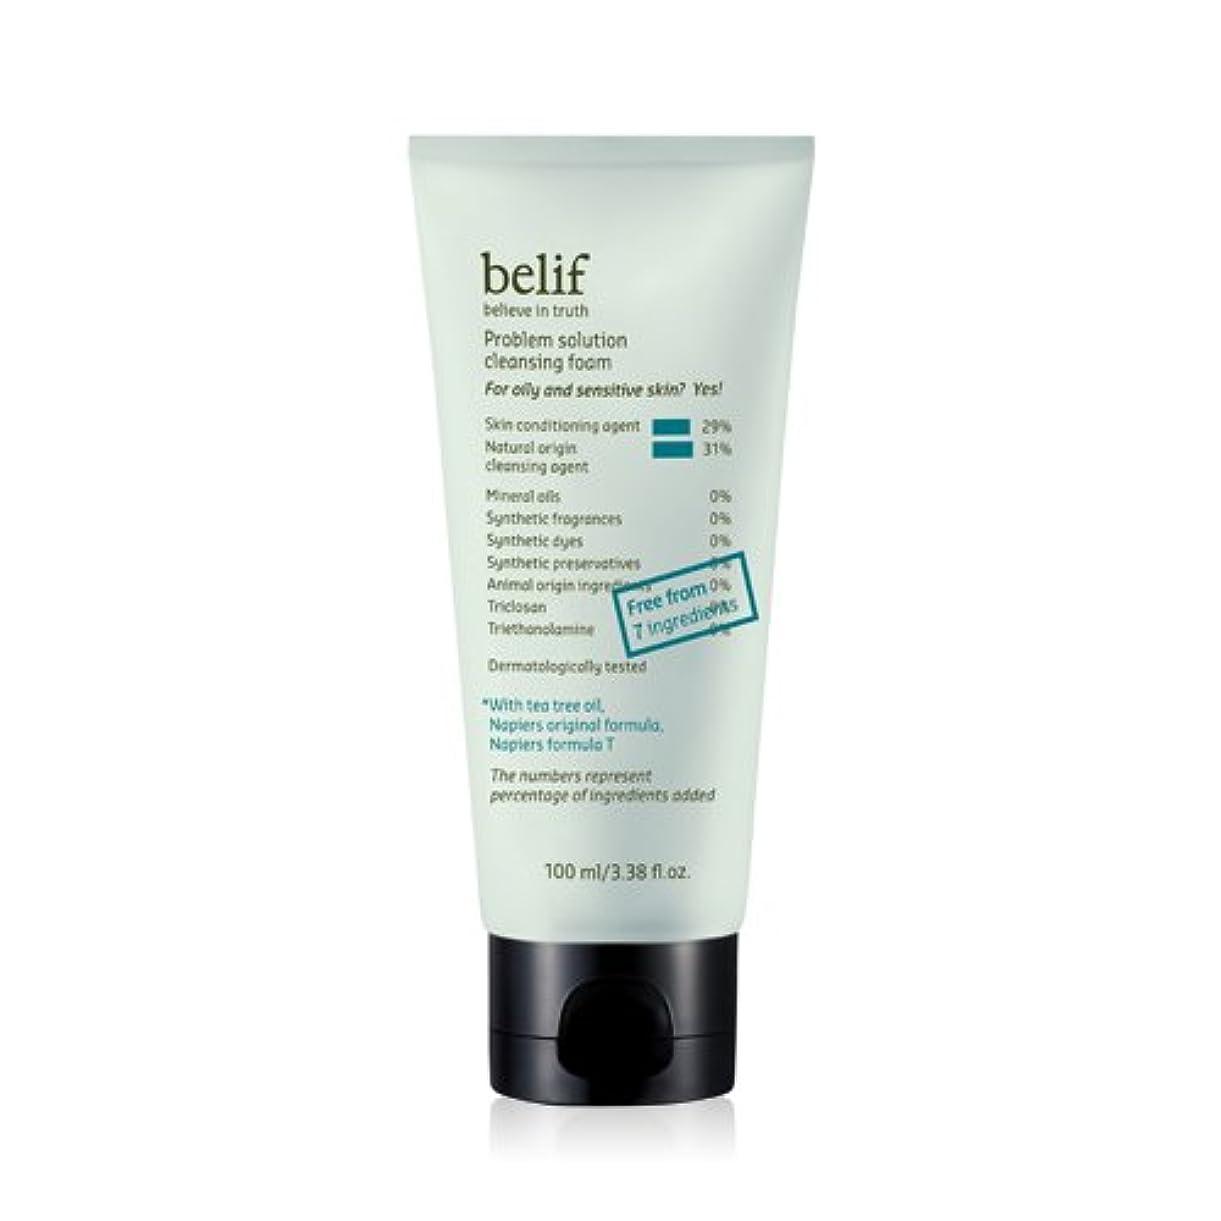 belf(ビリフ)プロブレム ソリューション グリーン クレンジング フォーム(Problem solution green cleansing foam)100ml